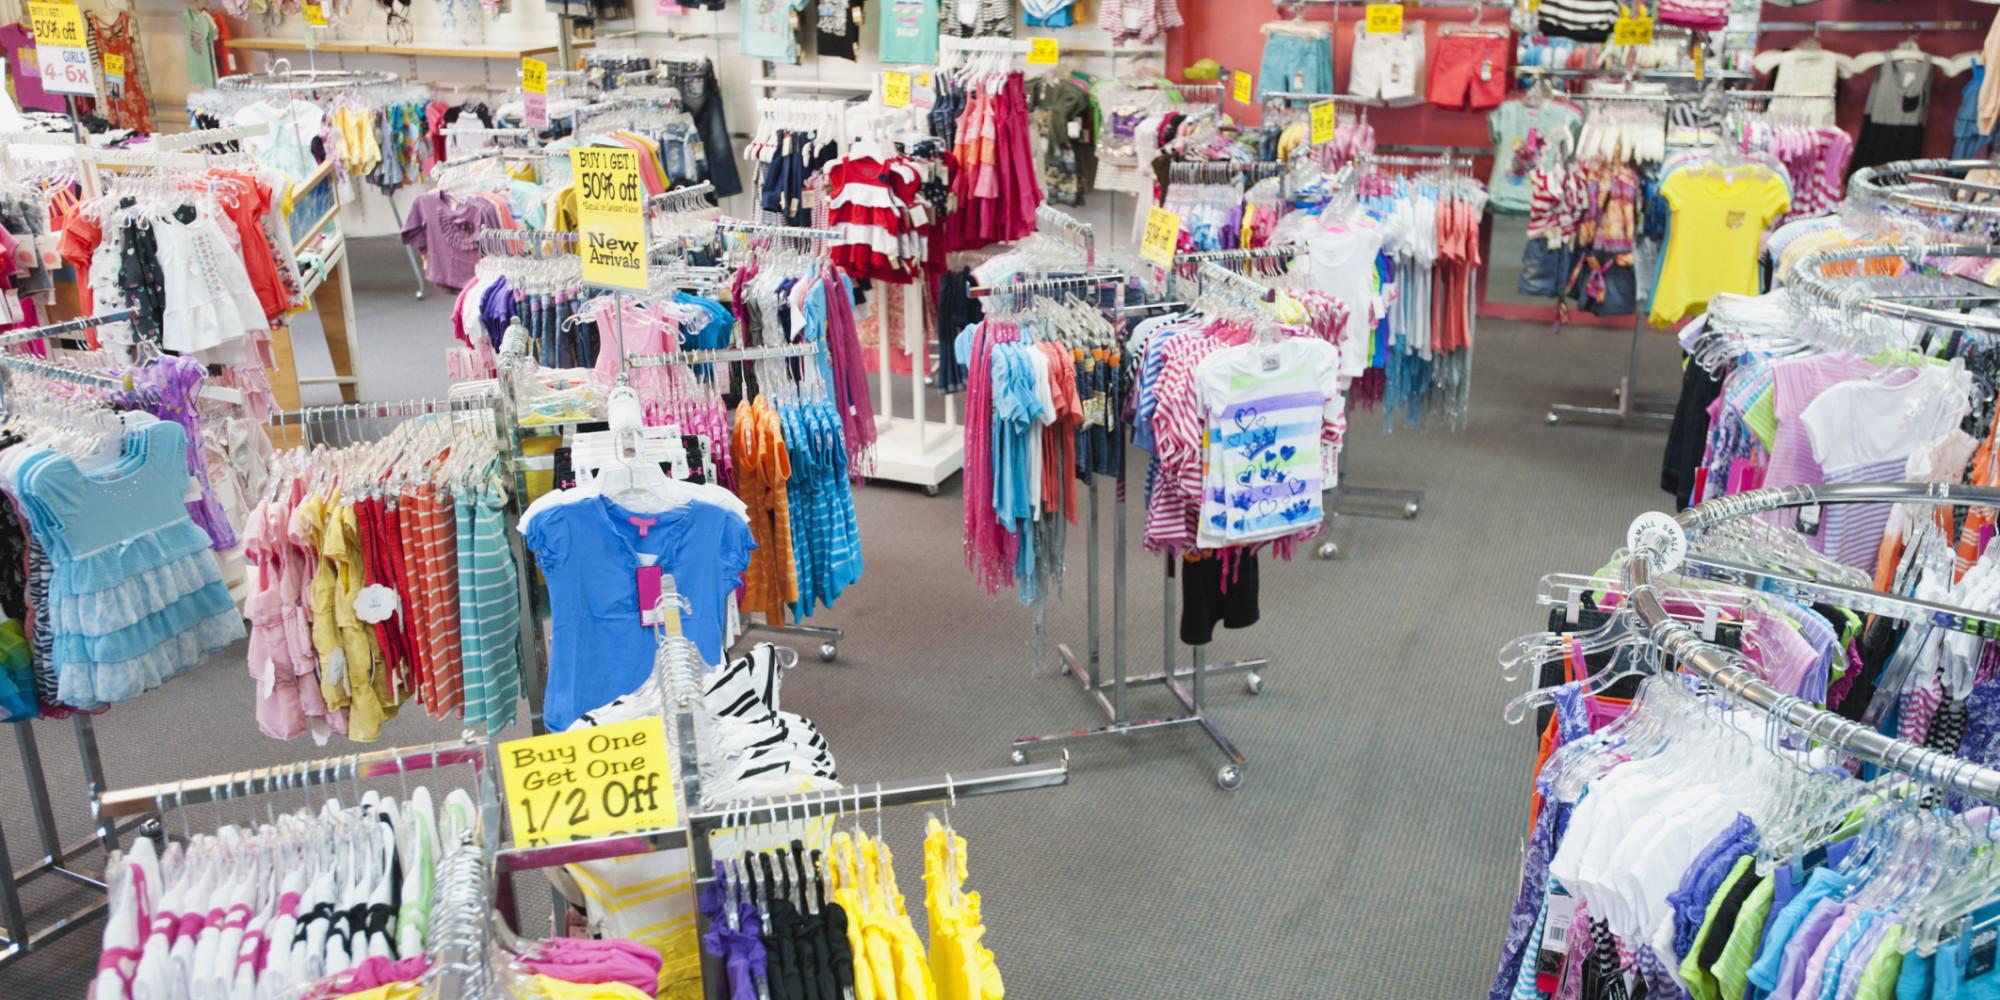 KIDS-CLOTHES-SHOPPING-facebook.jpg